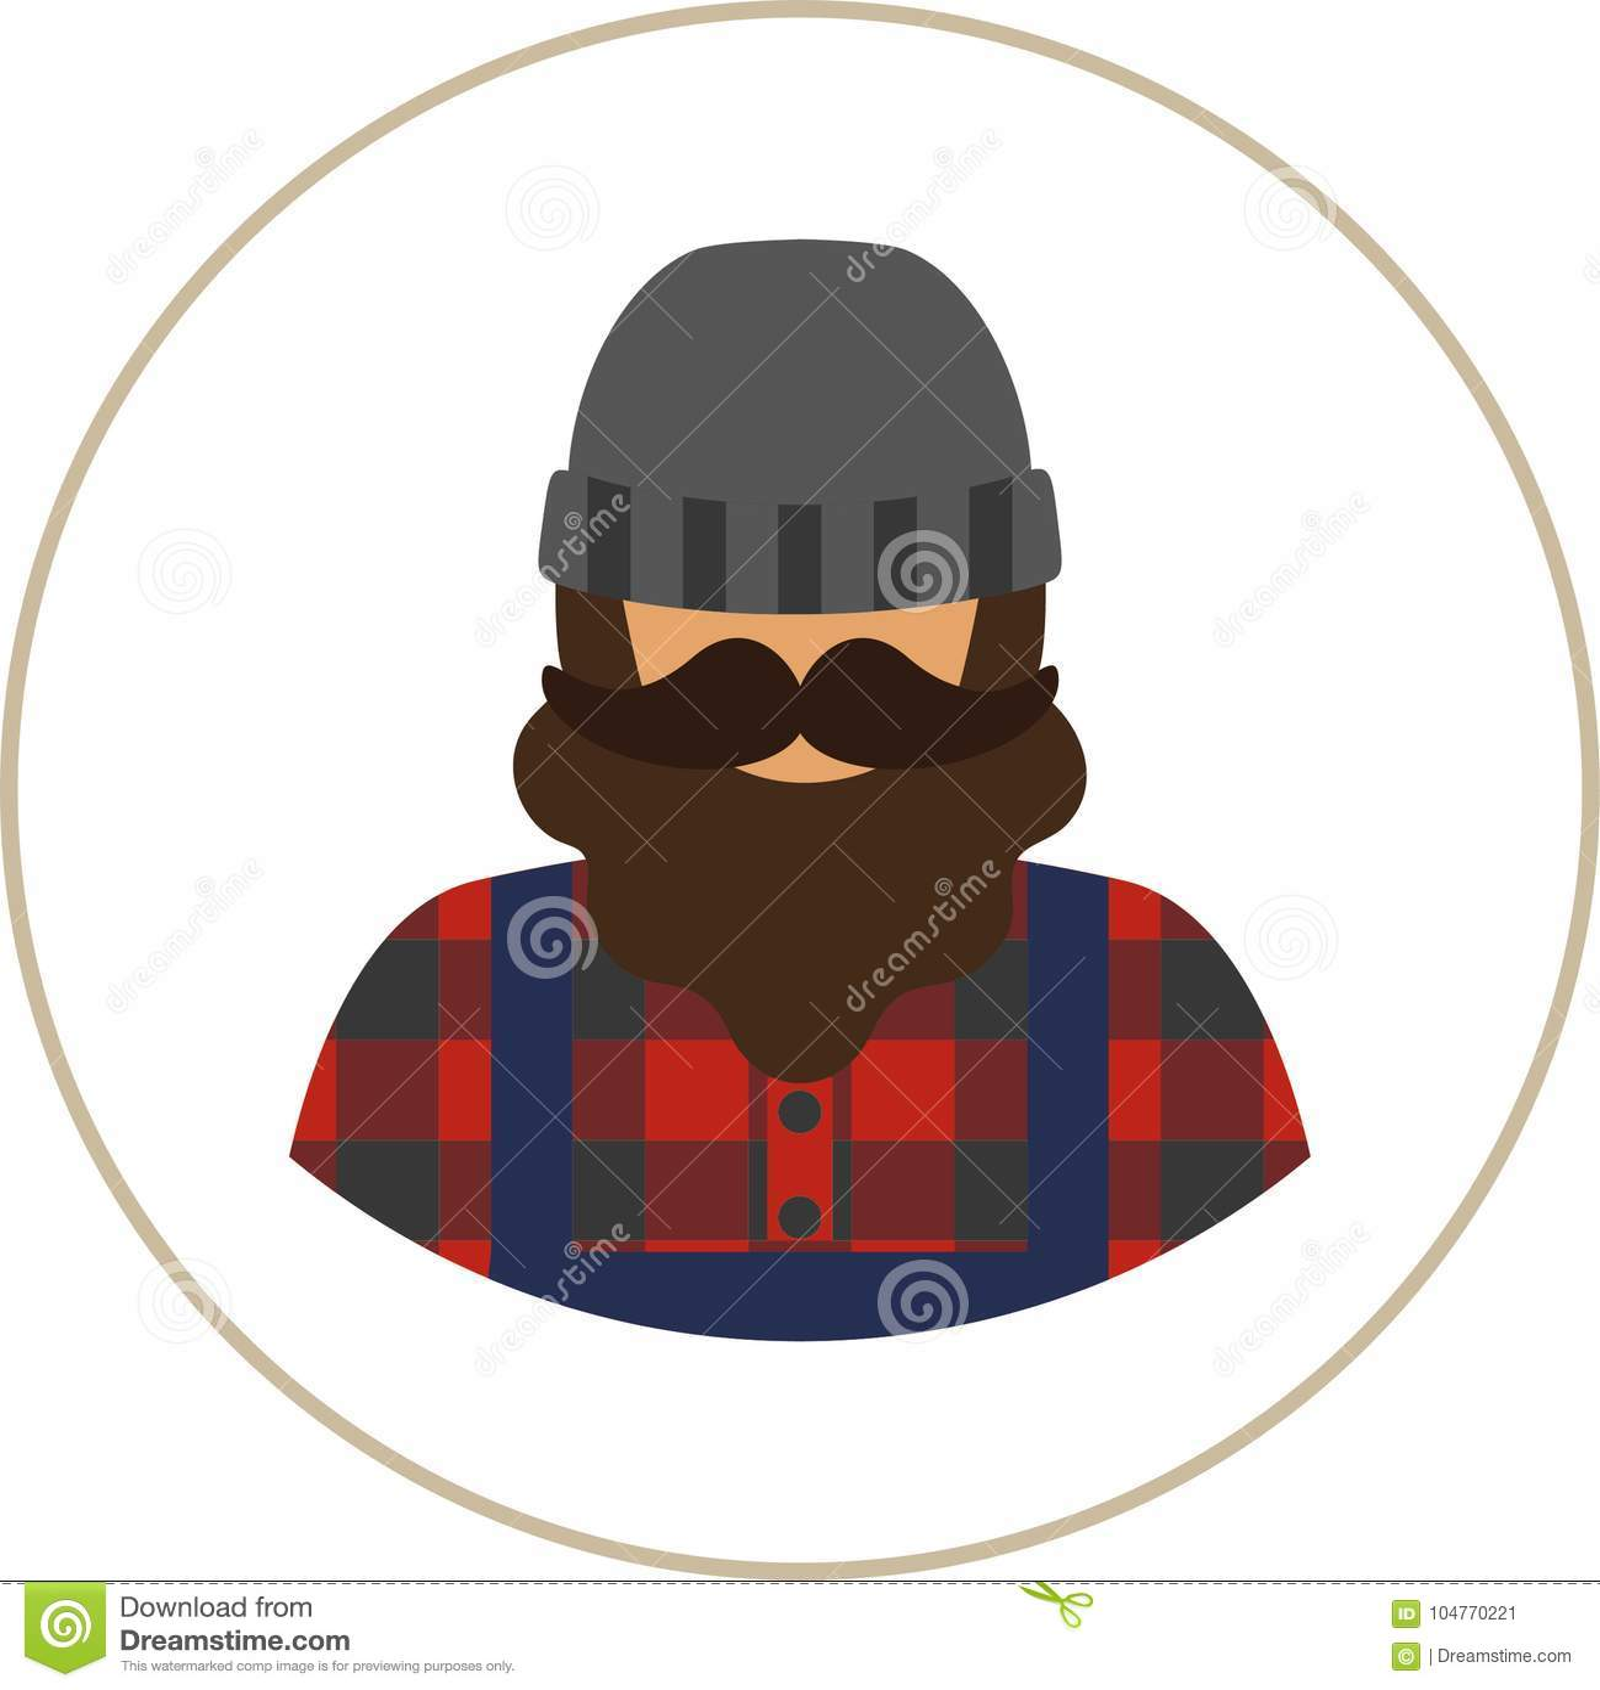 0c5e51e6fce Farmer worker flat icon - a man with a mustache a beard wearing an in a  plaid shirt